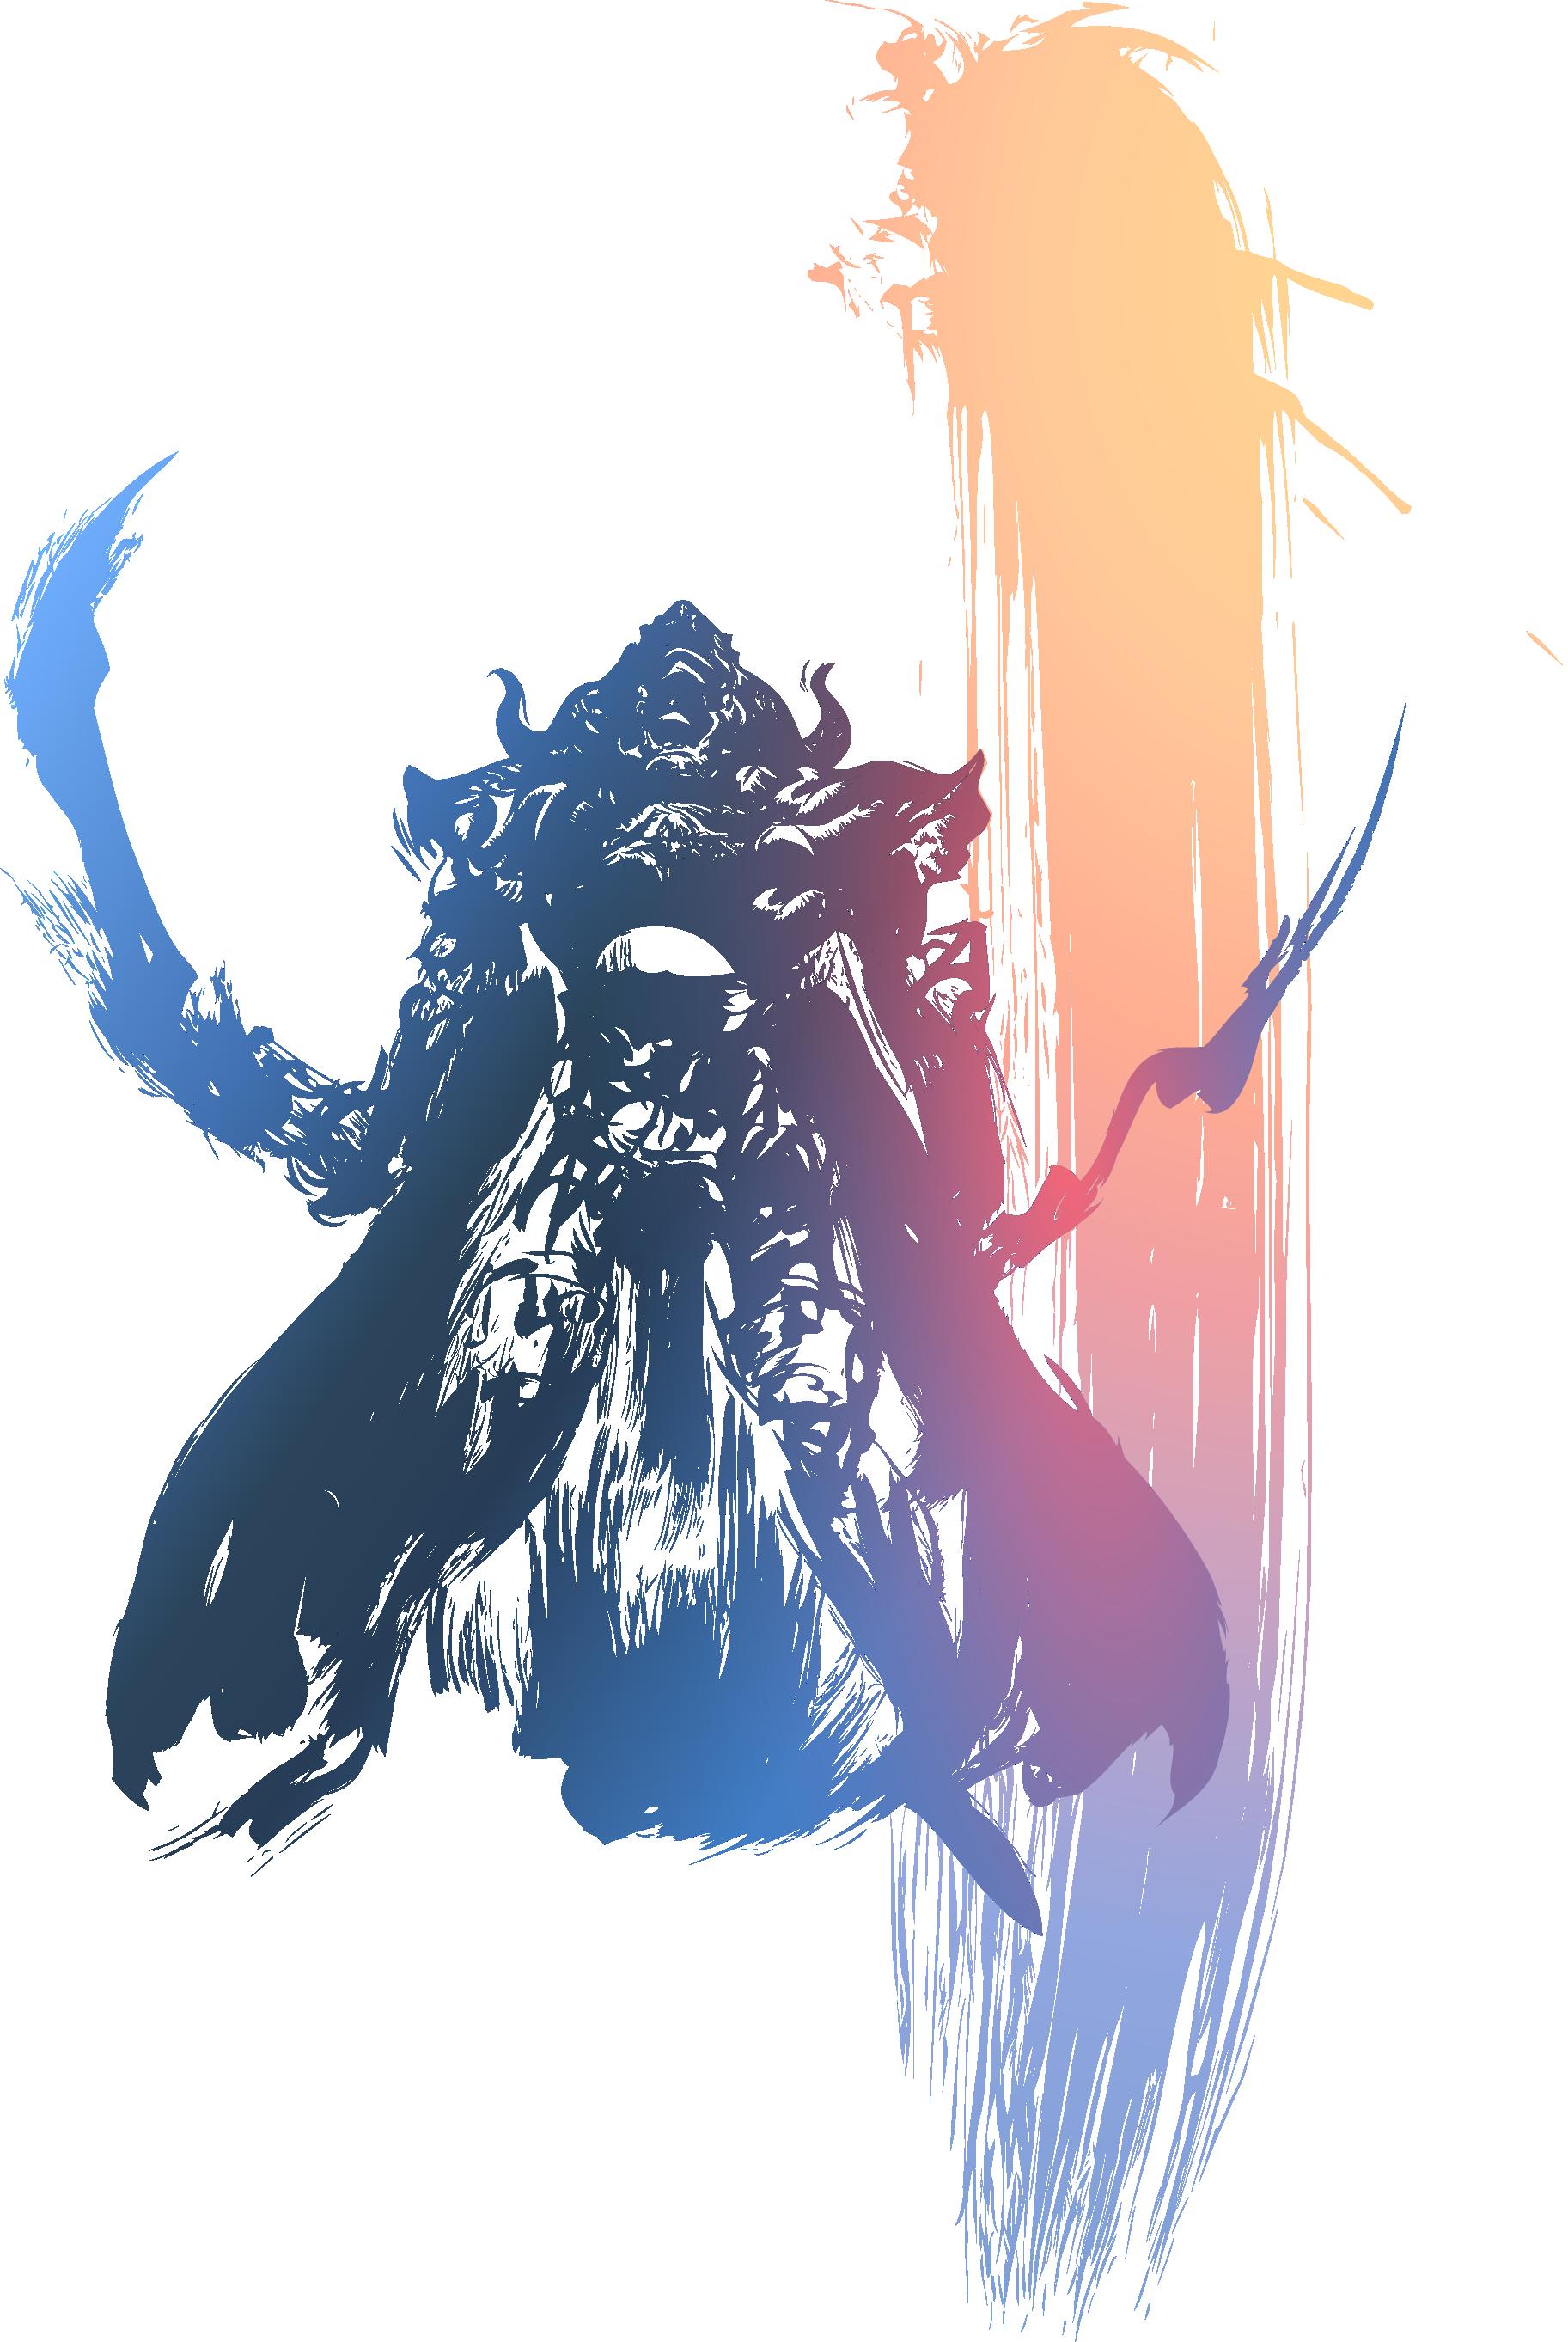 Final fantasy logo art - photo#4